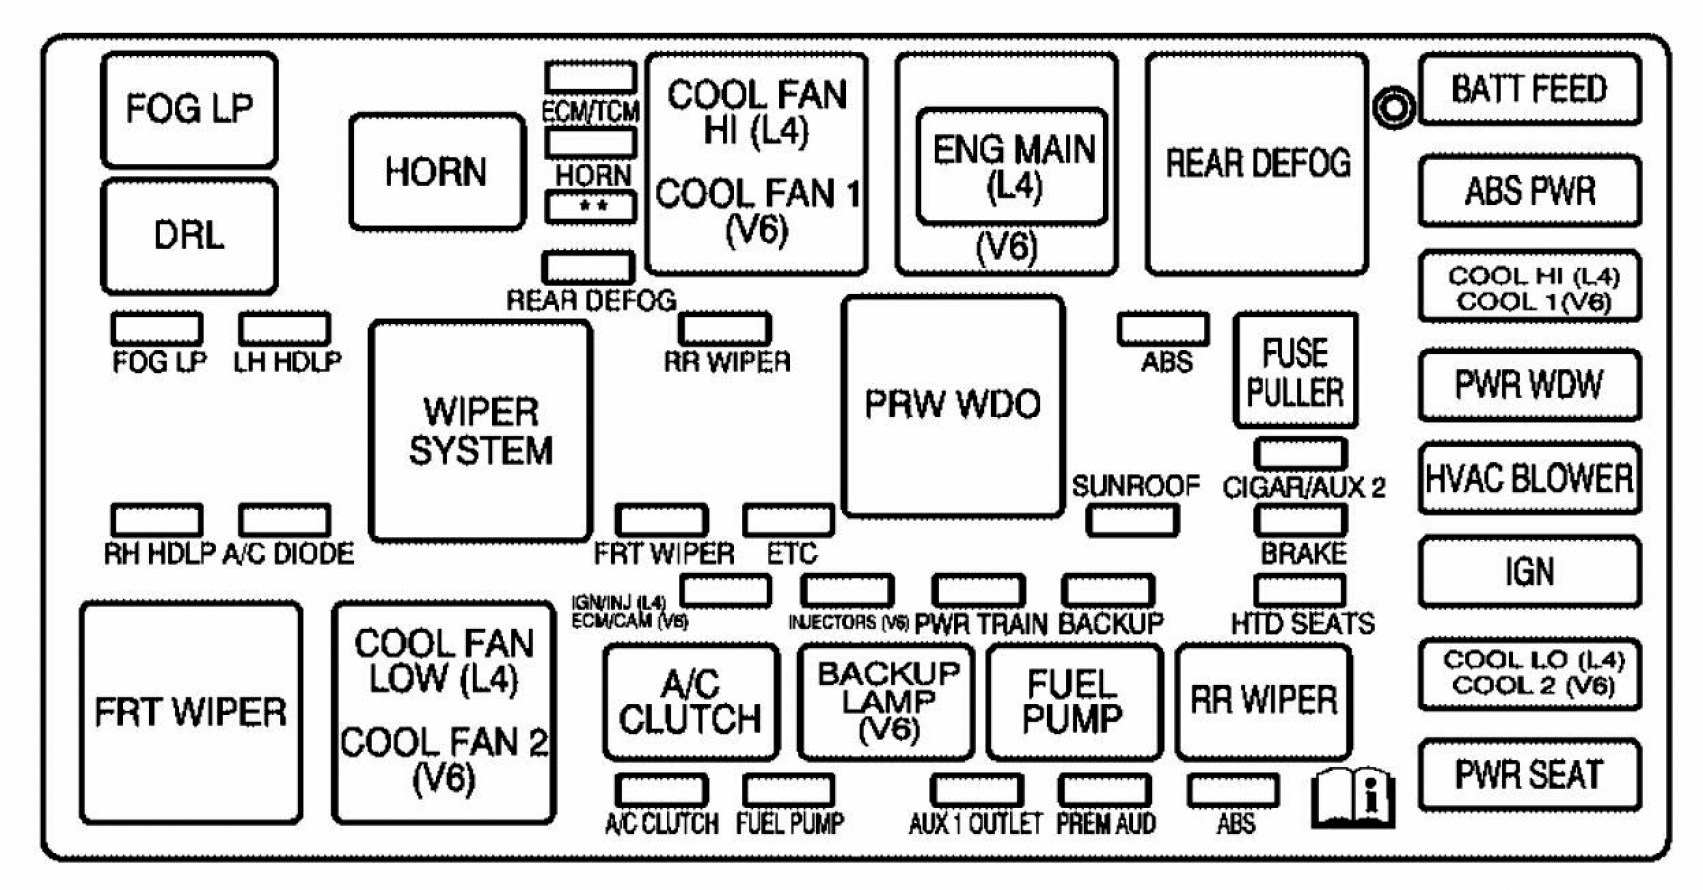 2011 scion xd fuse diagram my 9511  fj cruiser fuse box  my 9511  fj cruiser fuse box